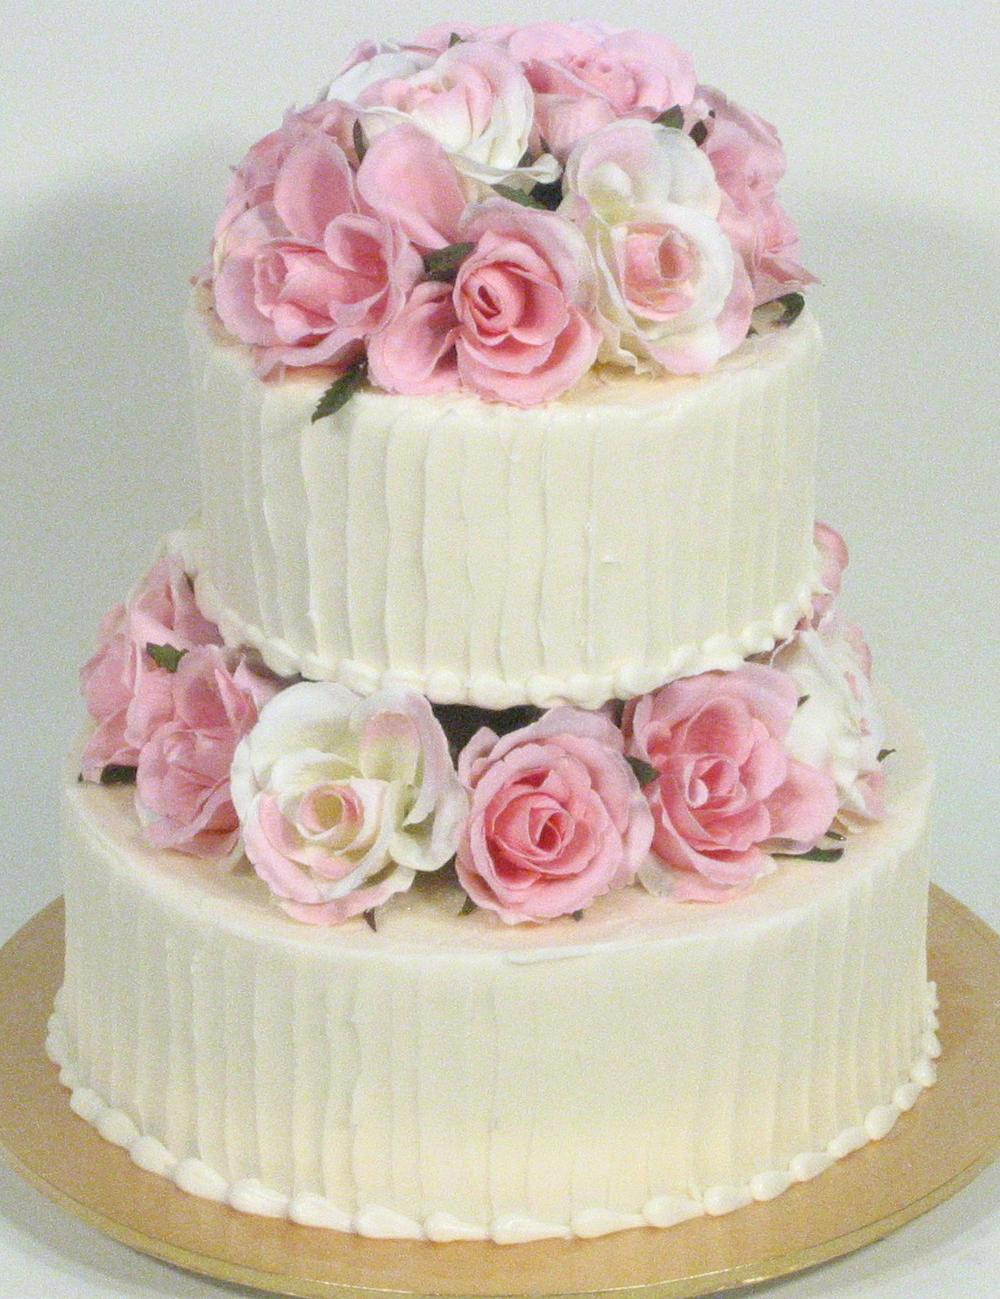 Wedding Cake Options - Kidd\'s Cakes & Bakery